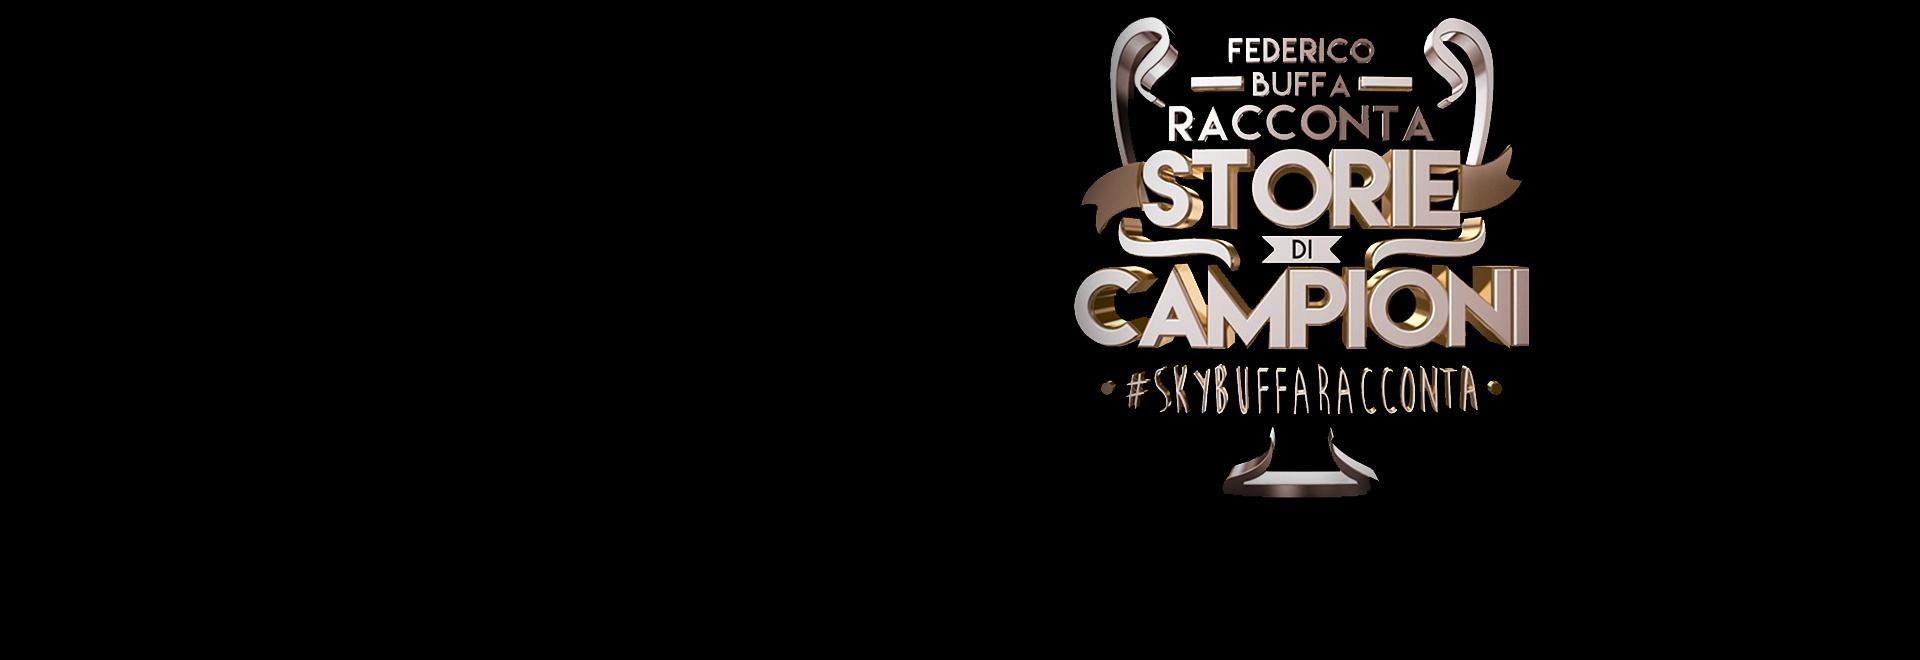 Federico Buffa racconta Storie di Campioni